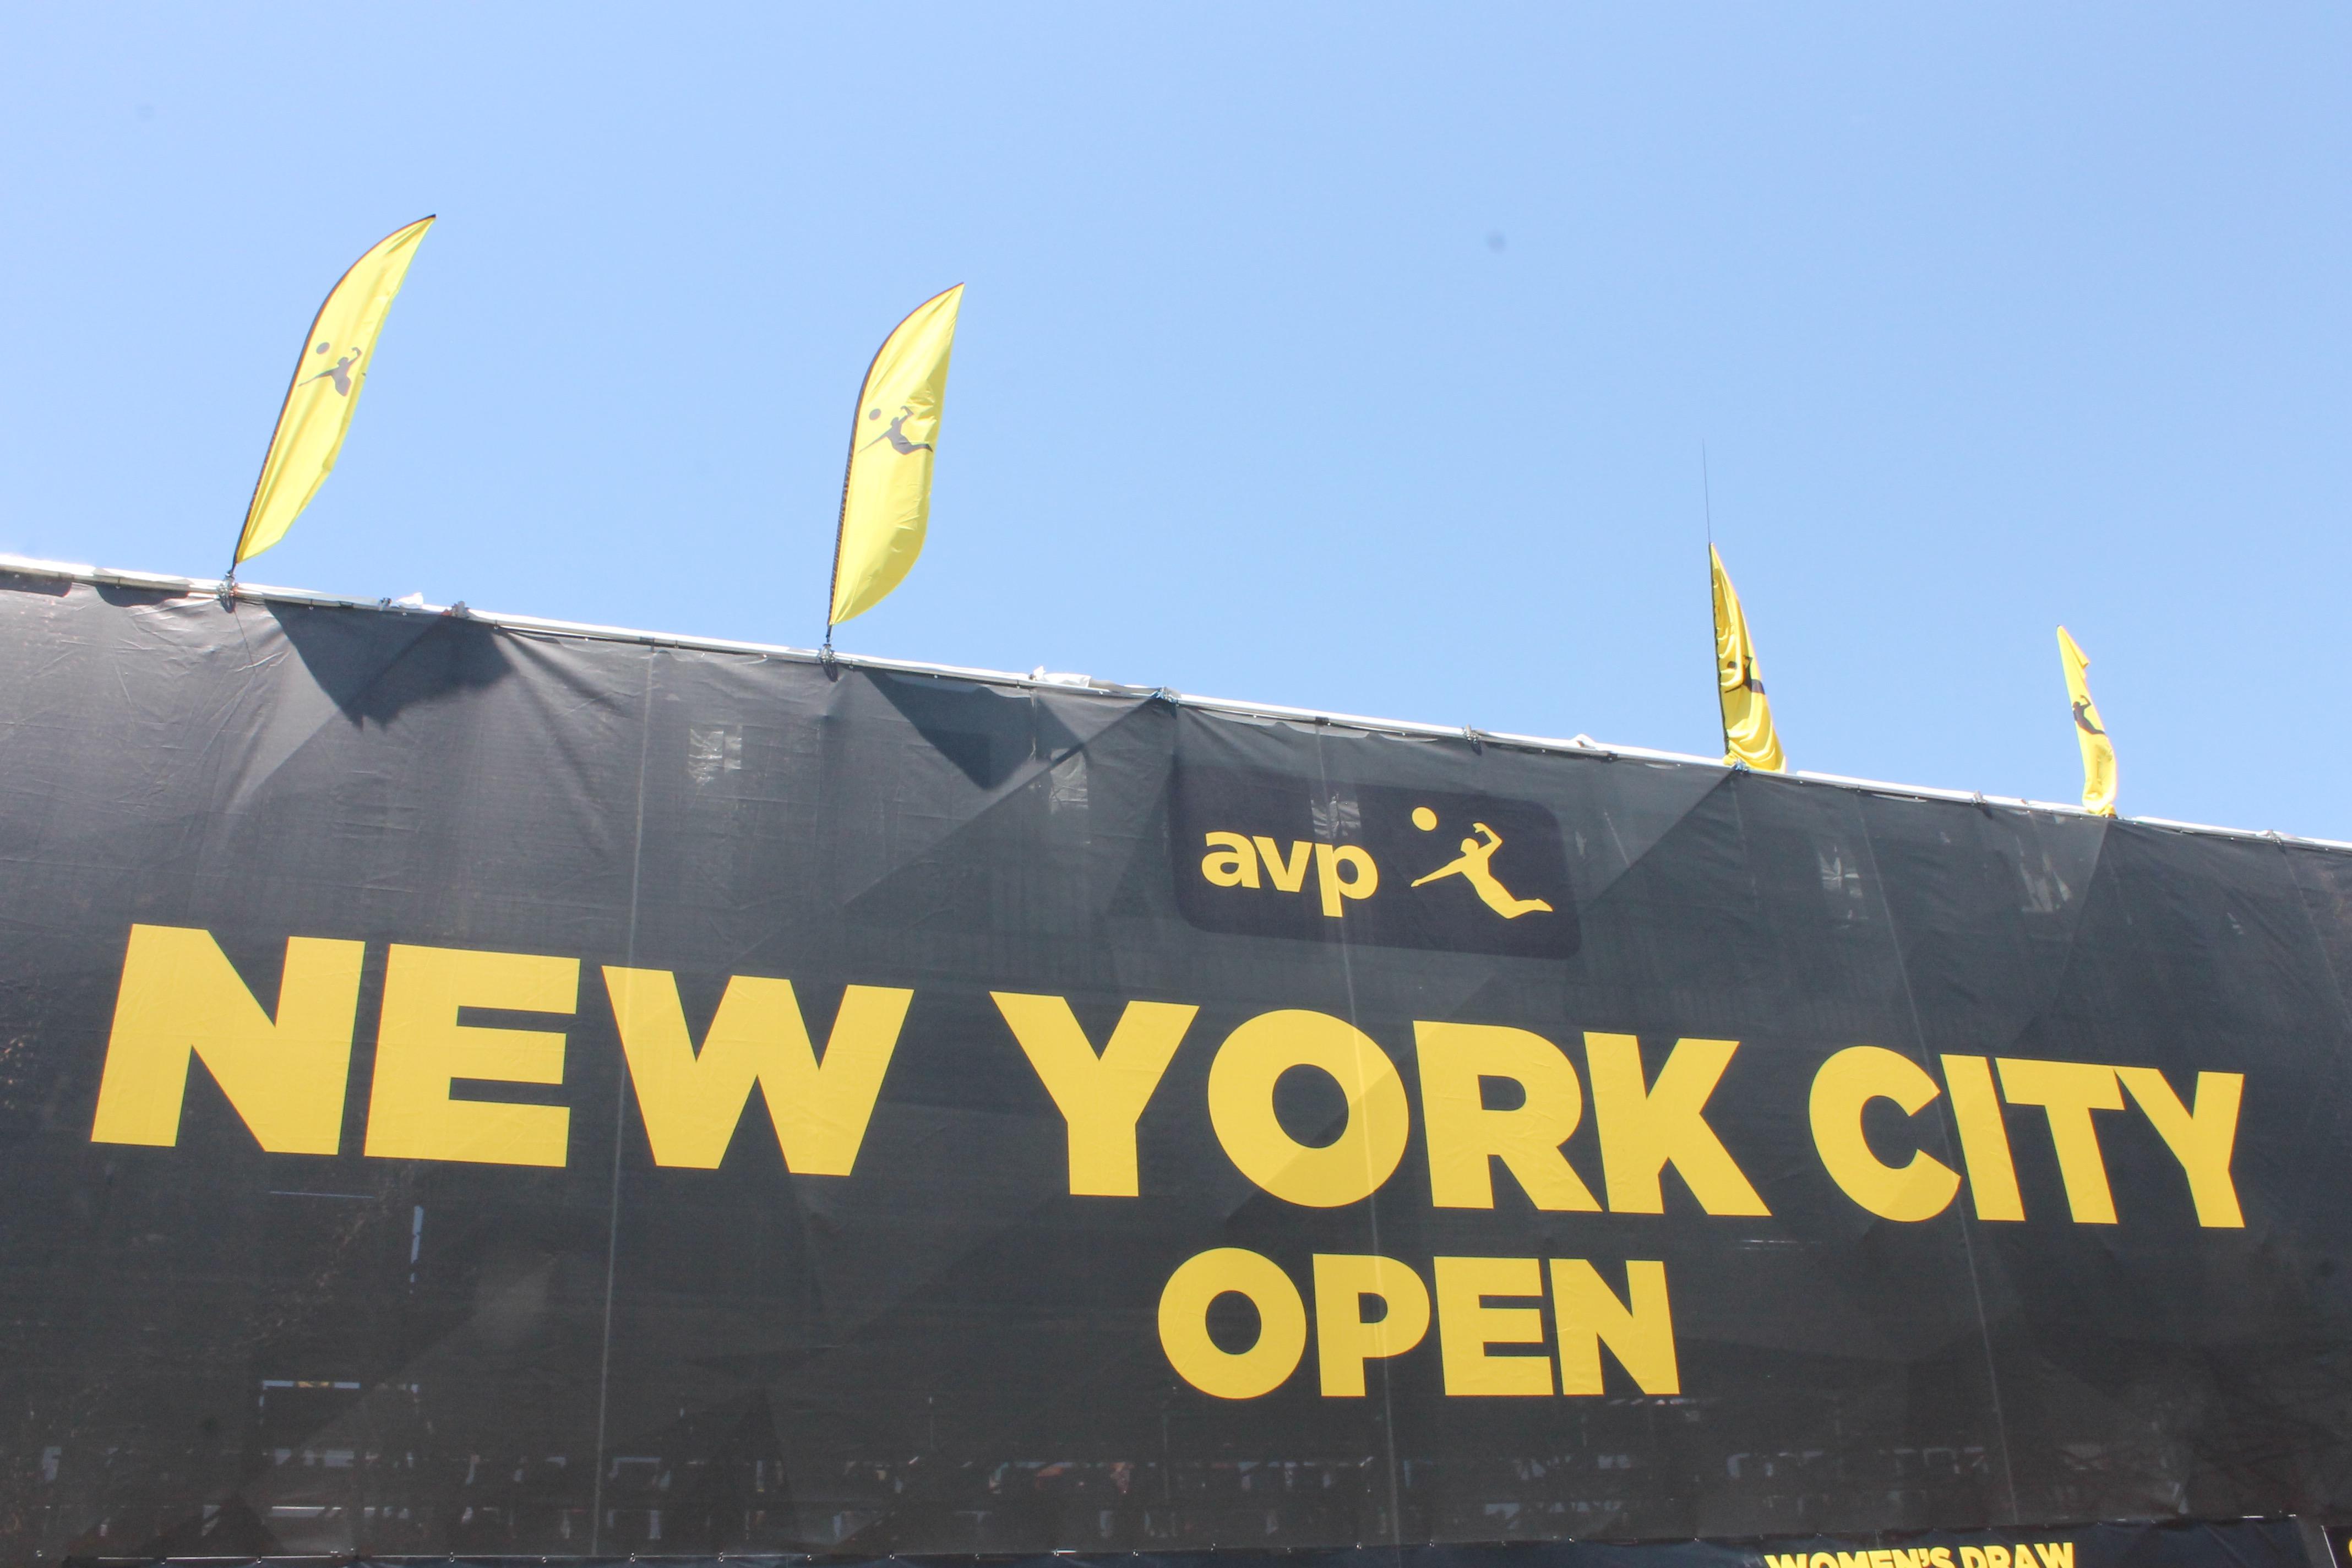 NYC AVP banner